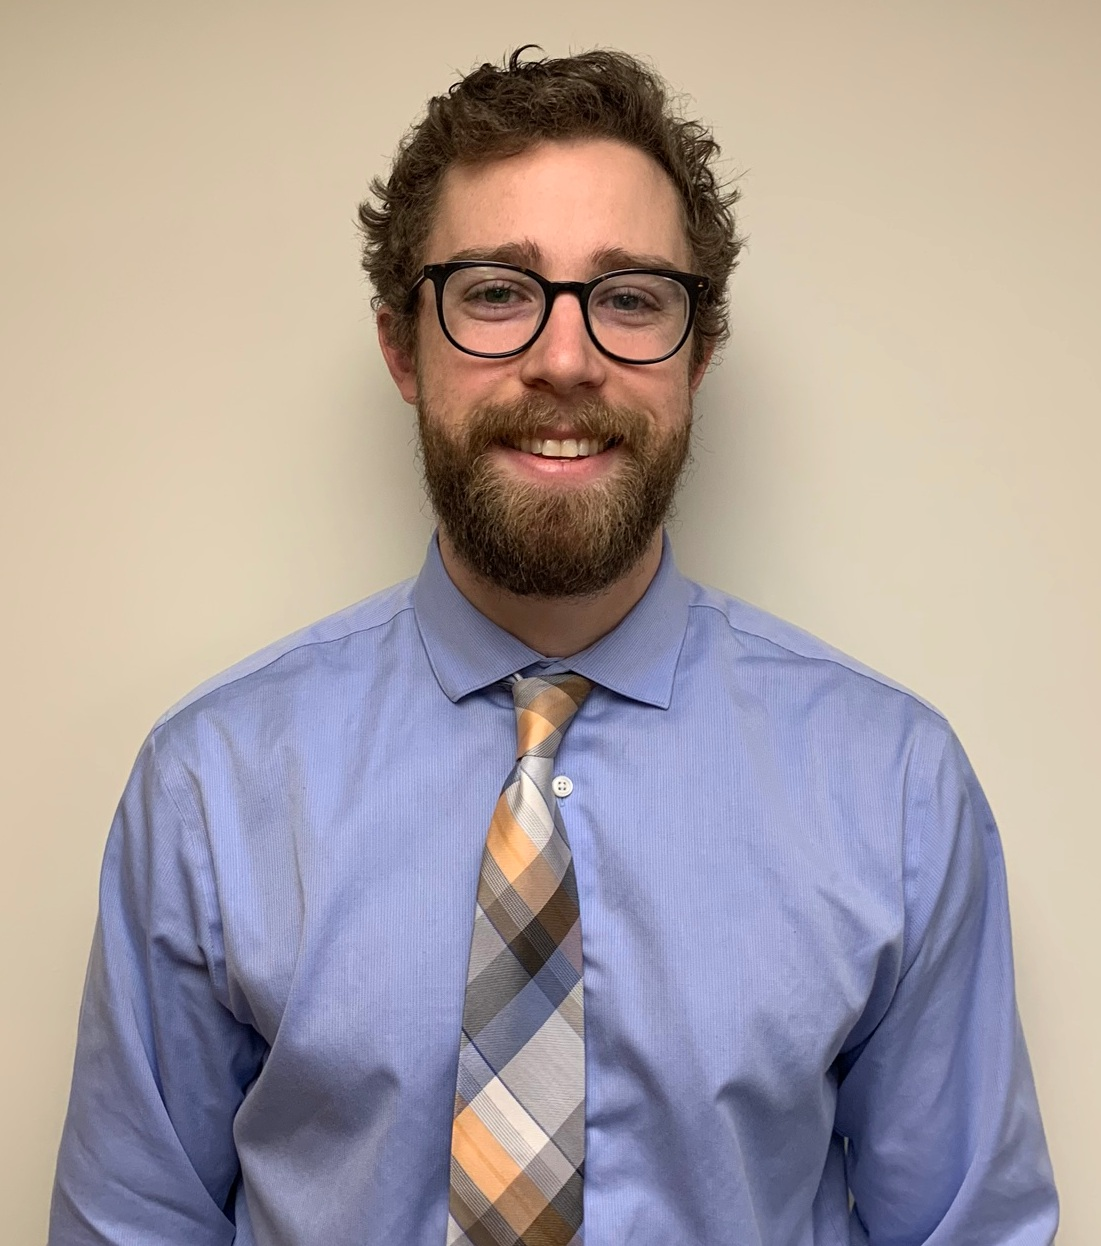 Harrison McUmber, Student Physician Tufts University